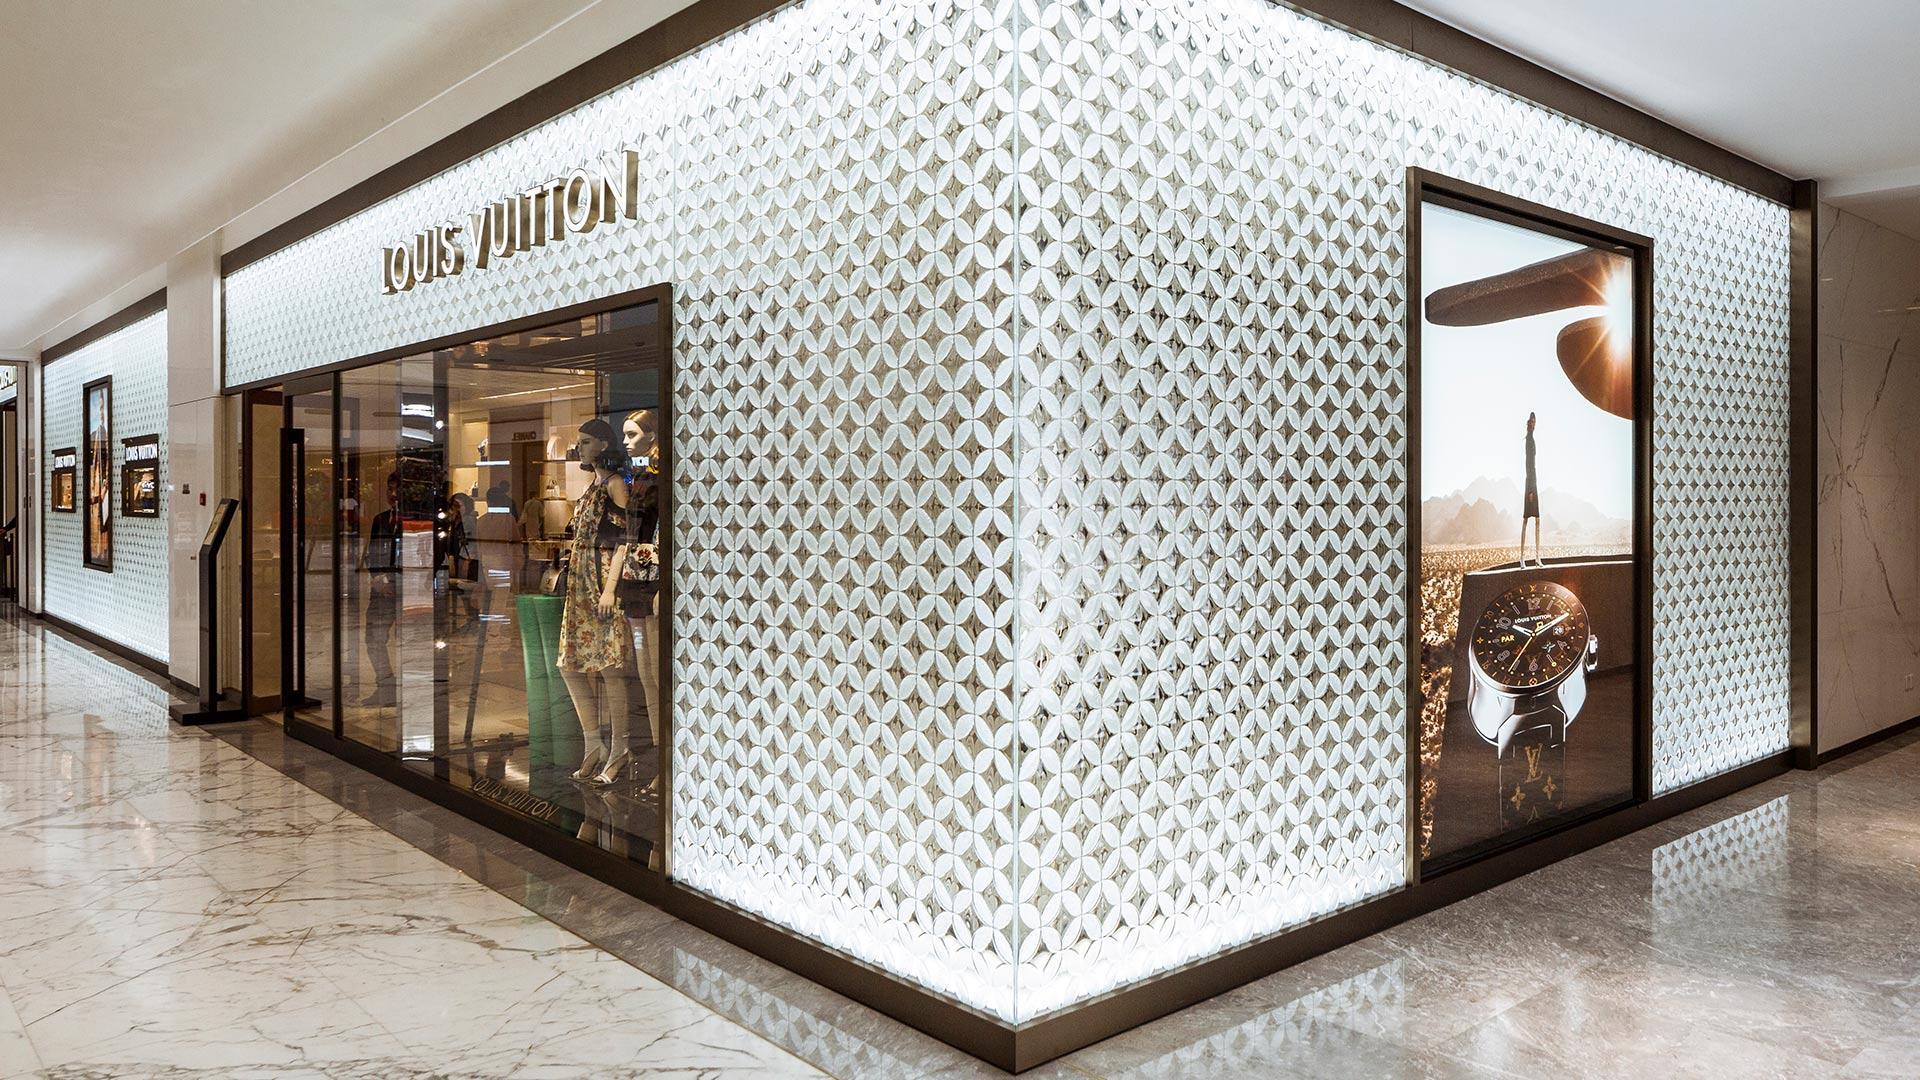 Los Angeles California Architectural Decorative Glass shop